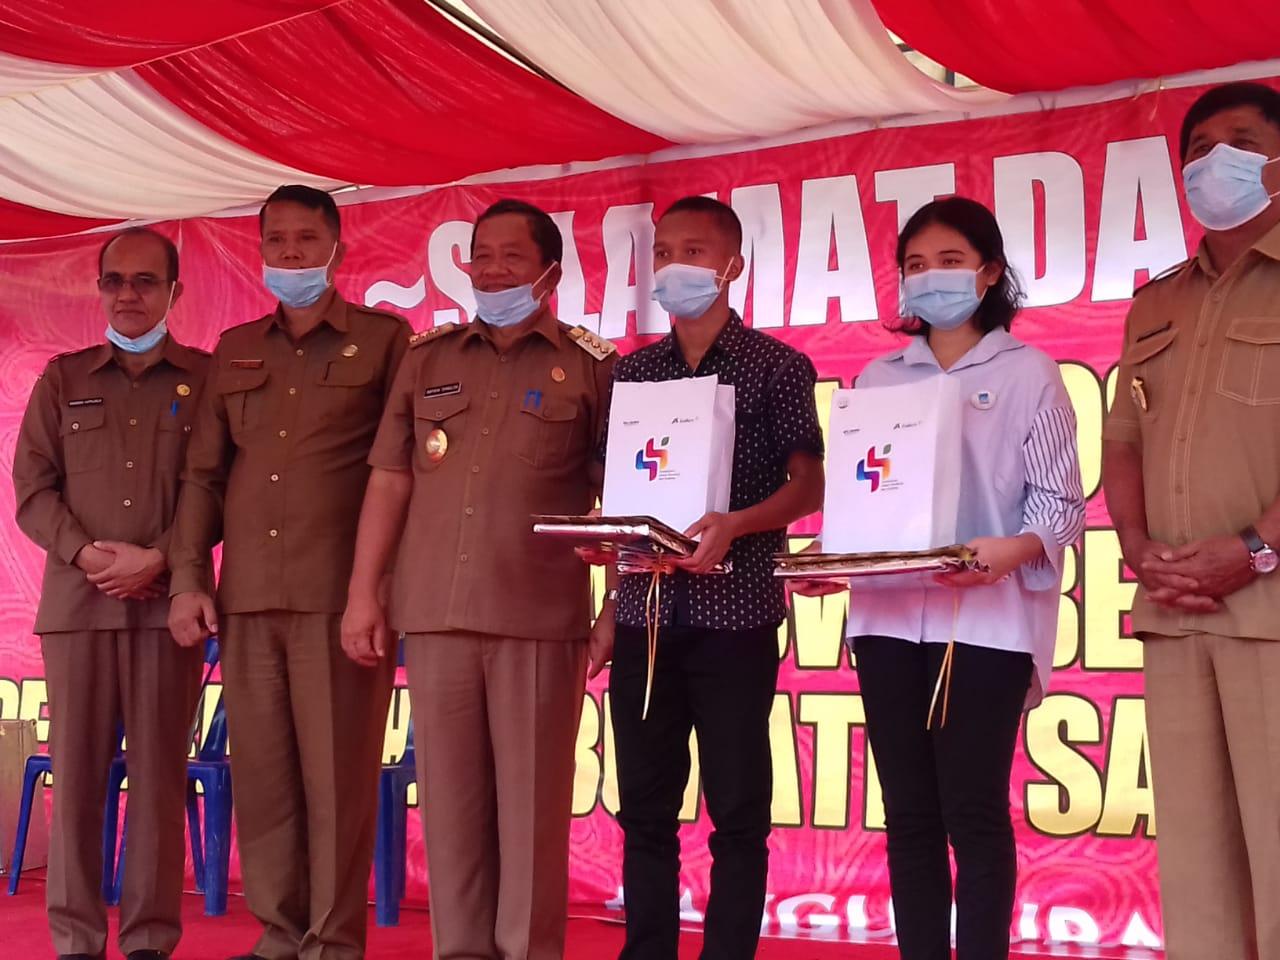 Foto : Bupati, Wakil Bupati Samosir, Kadisdik Samosir dan UPT SMA/SMK menyerahkan secara simbolis kepada Mahasiswa penerima Bansos Beasiswa